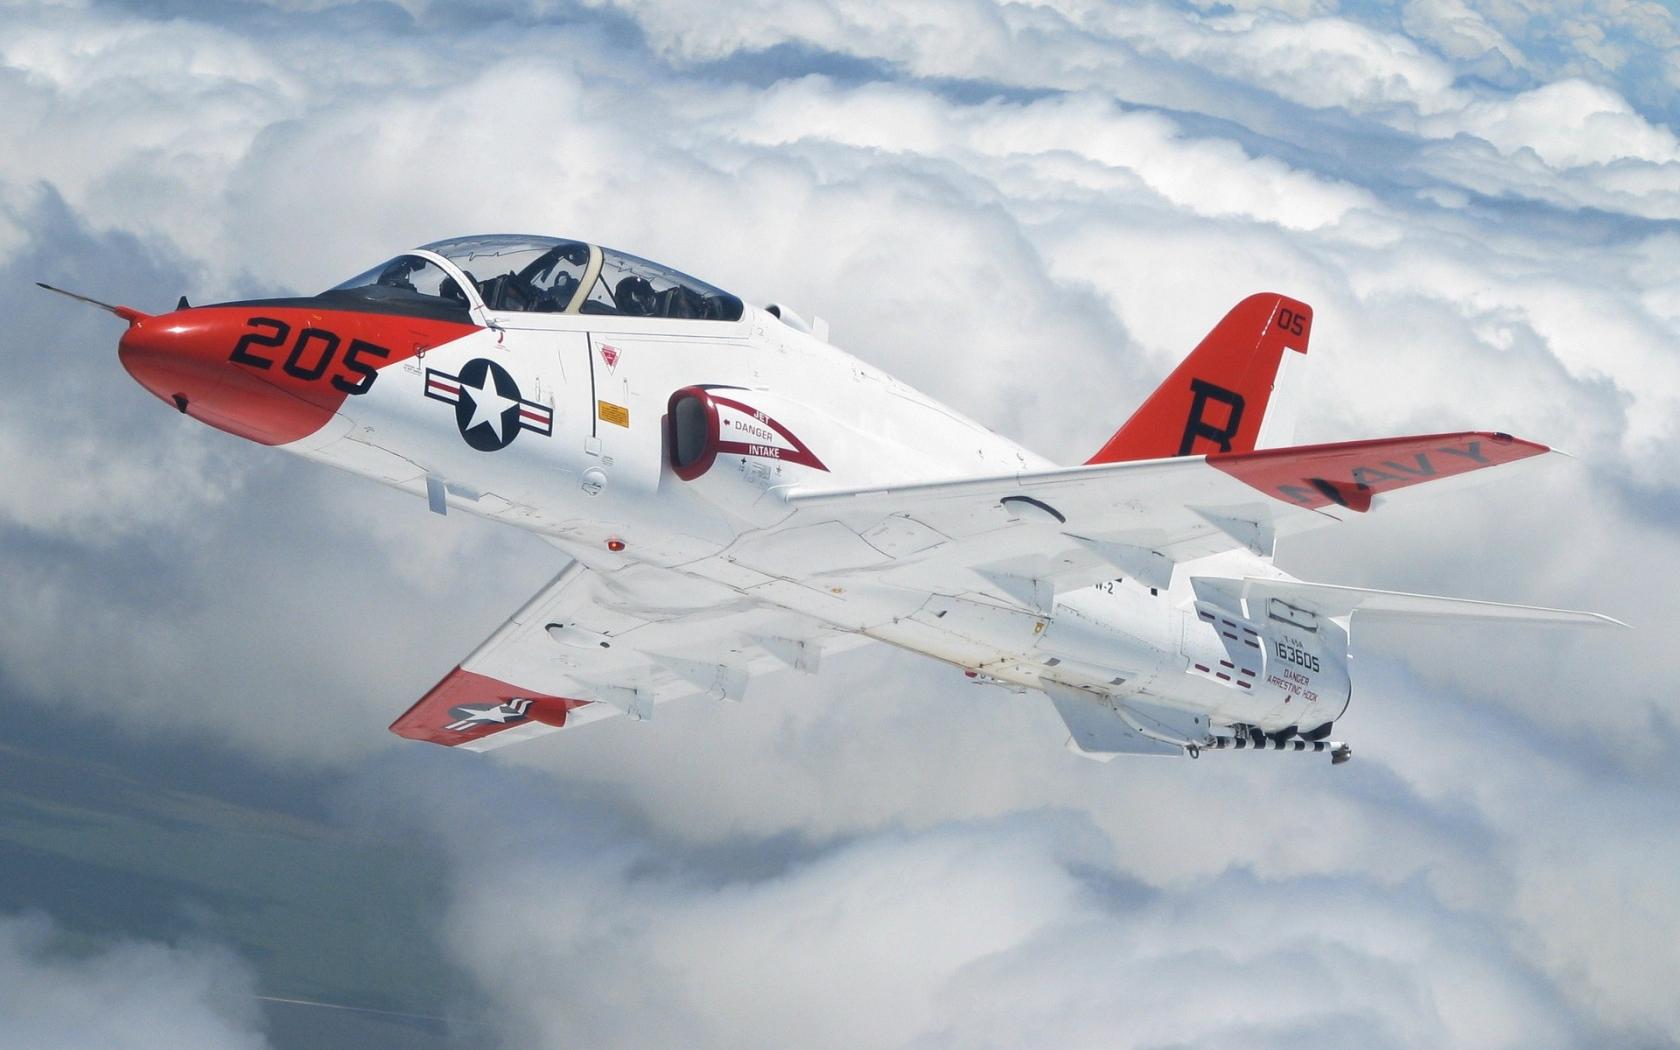 Avion de Guerra en los aires - 1680x1050